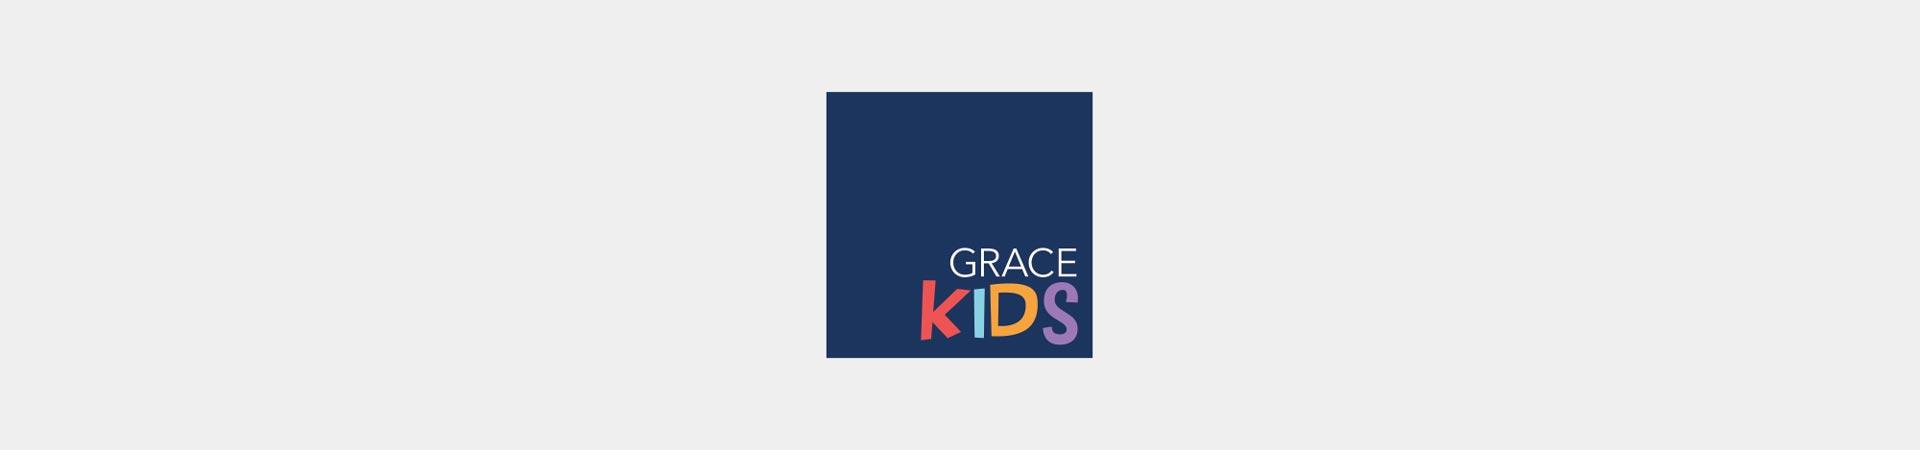 Children - Kindergarten through 5th grade - Grace Kids Elementary - Grace Community Church